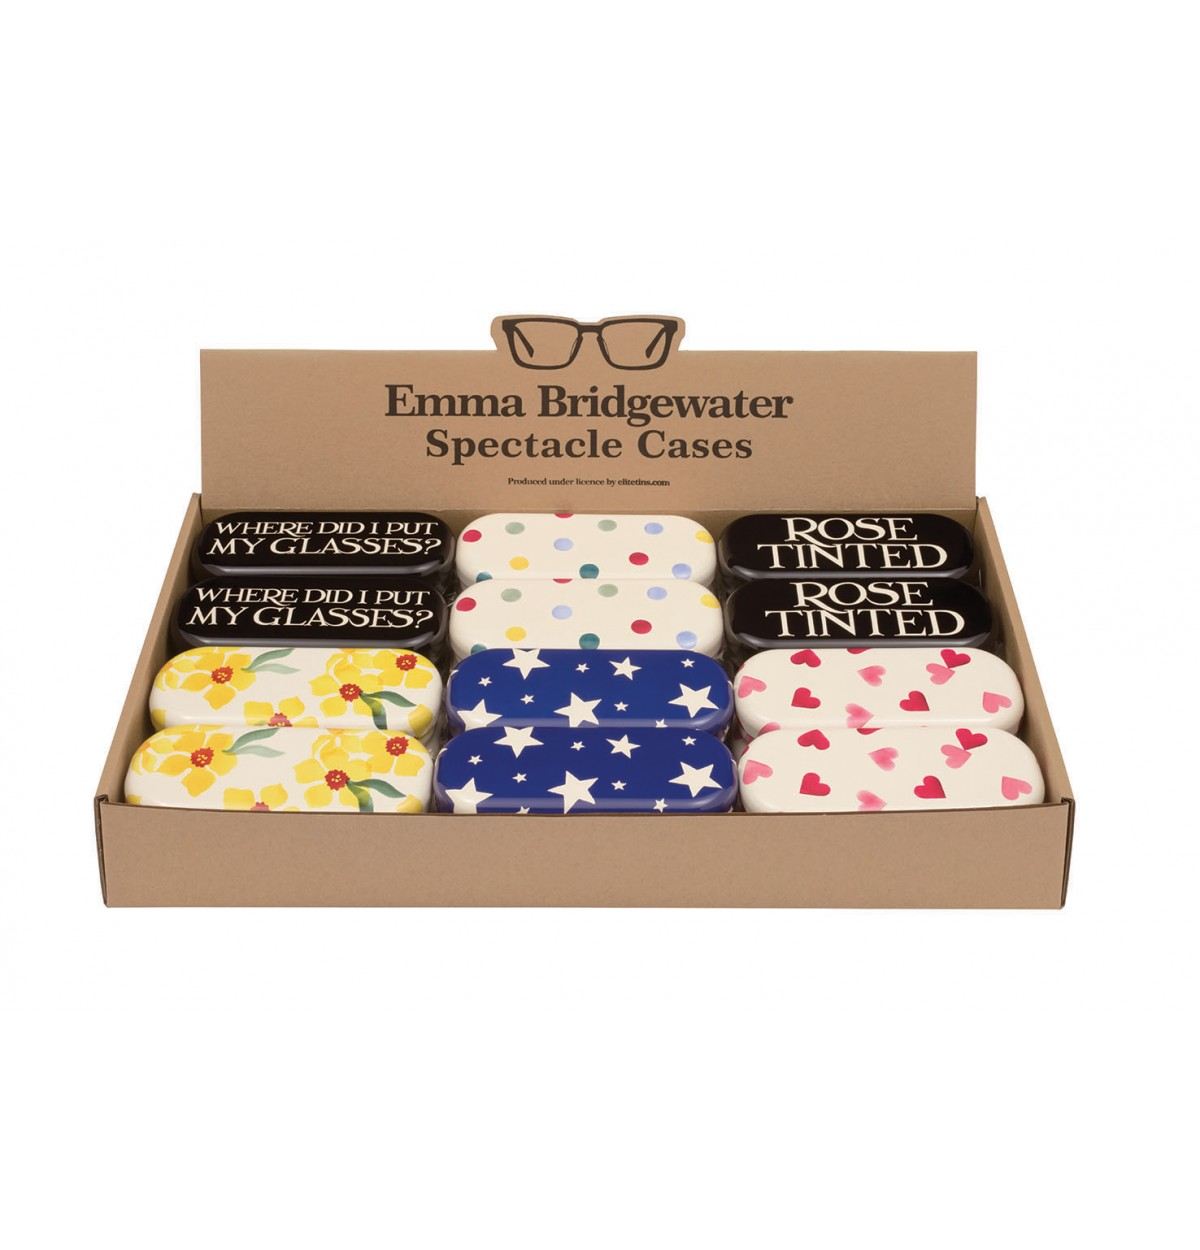 Emma Bridgewater eyeglass tins 4 designs